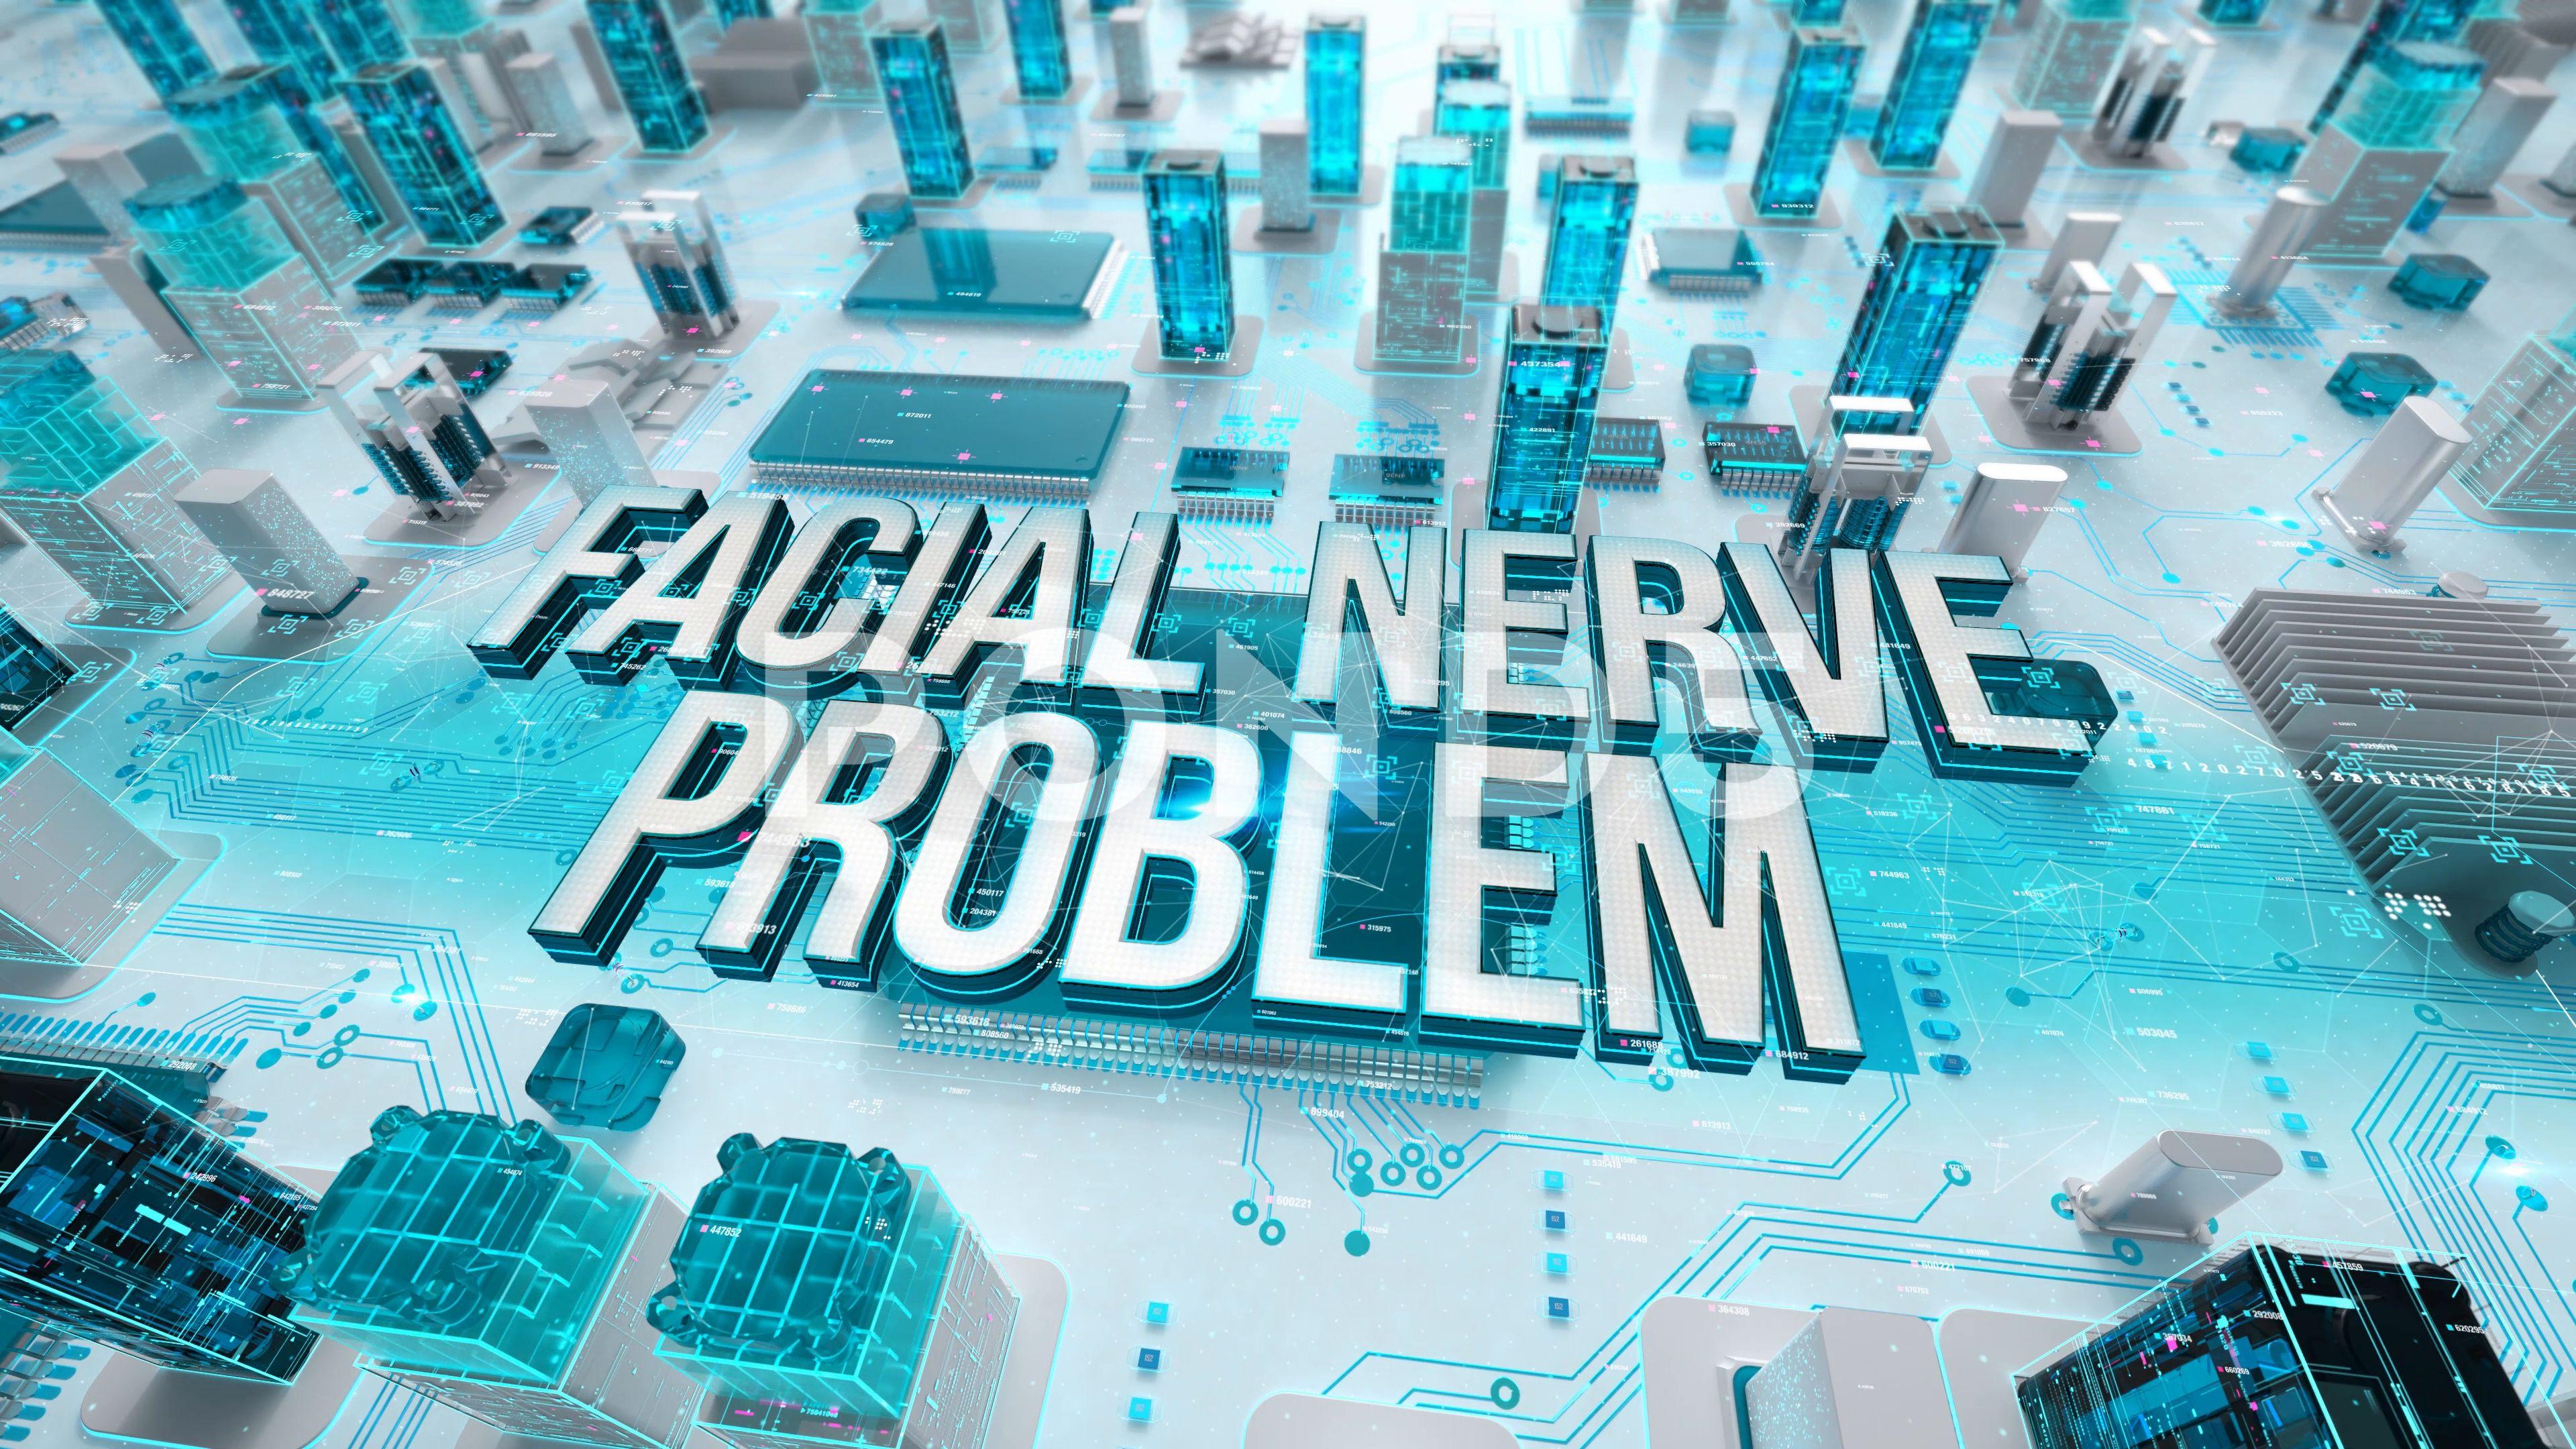 Facial Nerve Problem with medical digital technology concept Stock Footage ProblemmedicalFacialNerve